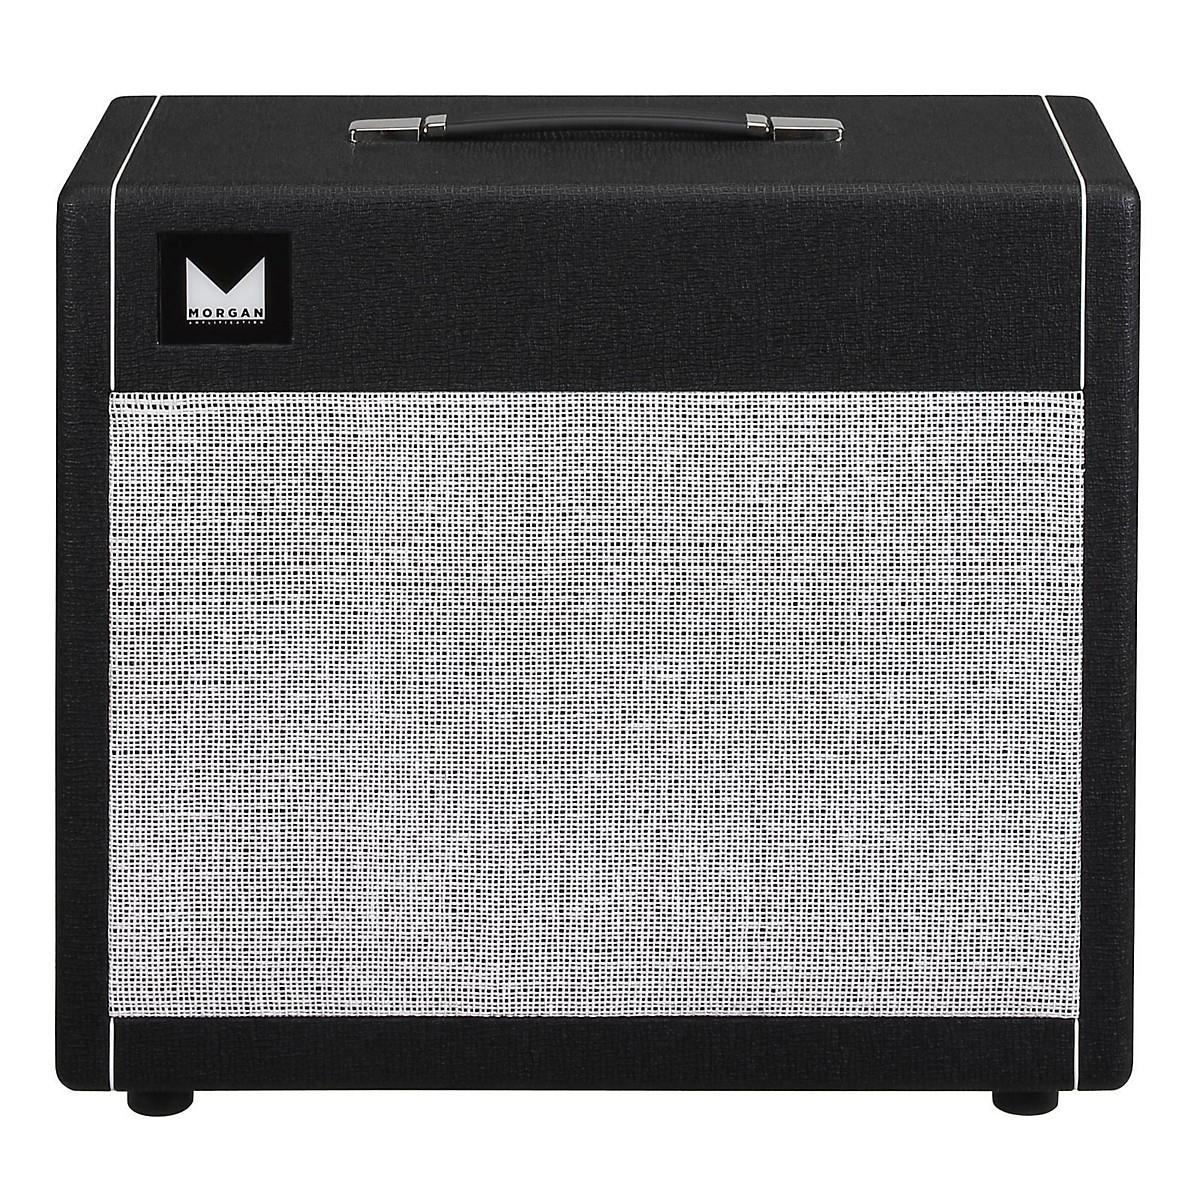 Morgan Amplification 1x12 Guitar Speaker Cabinet with Celestion Gold Speaker